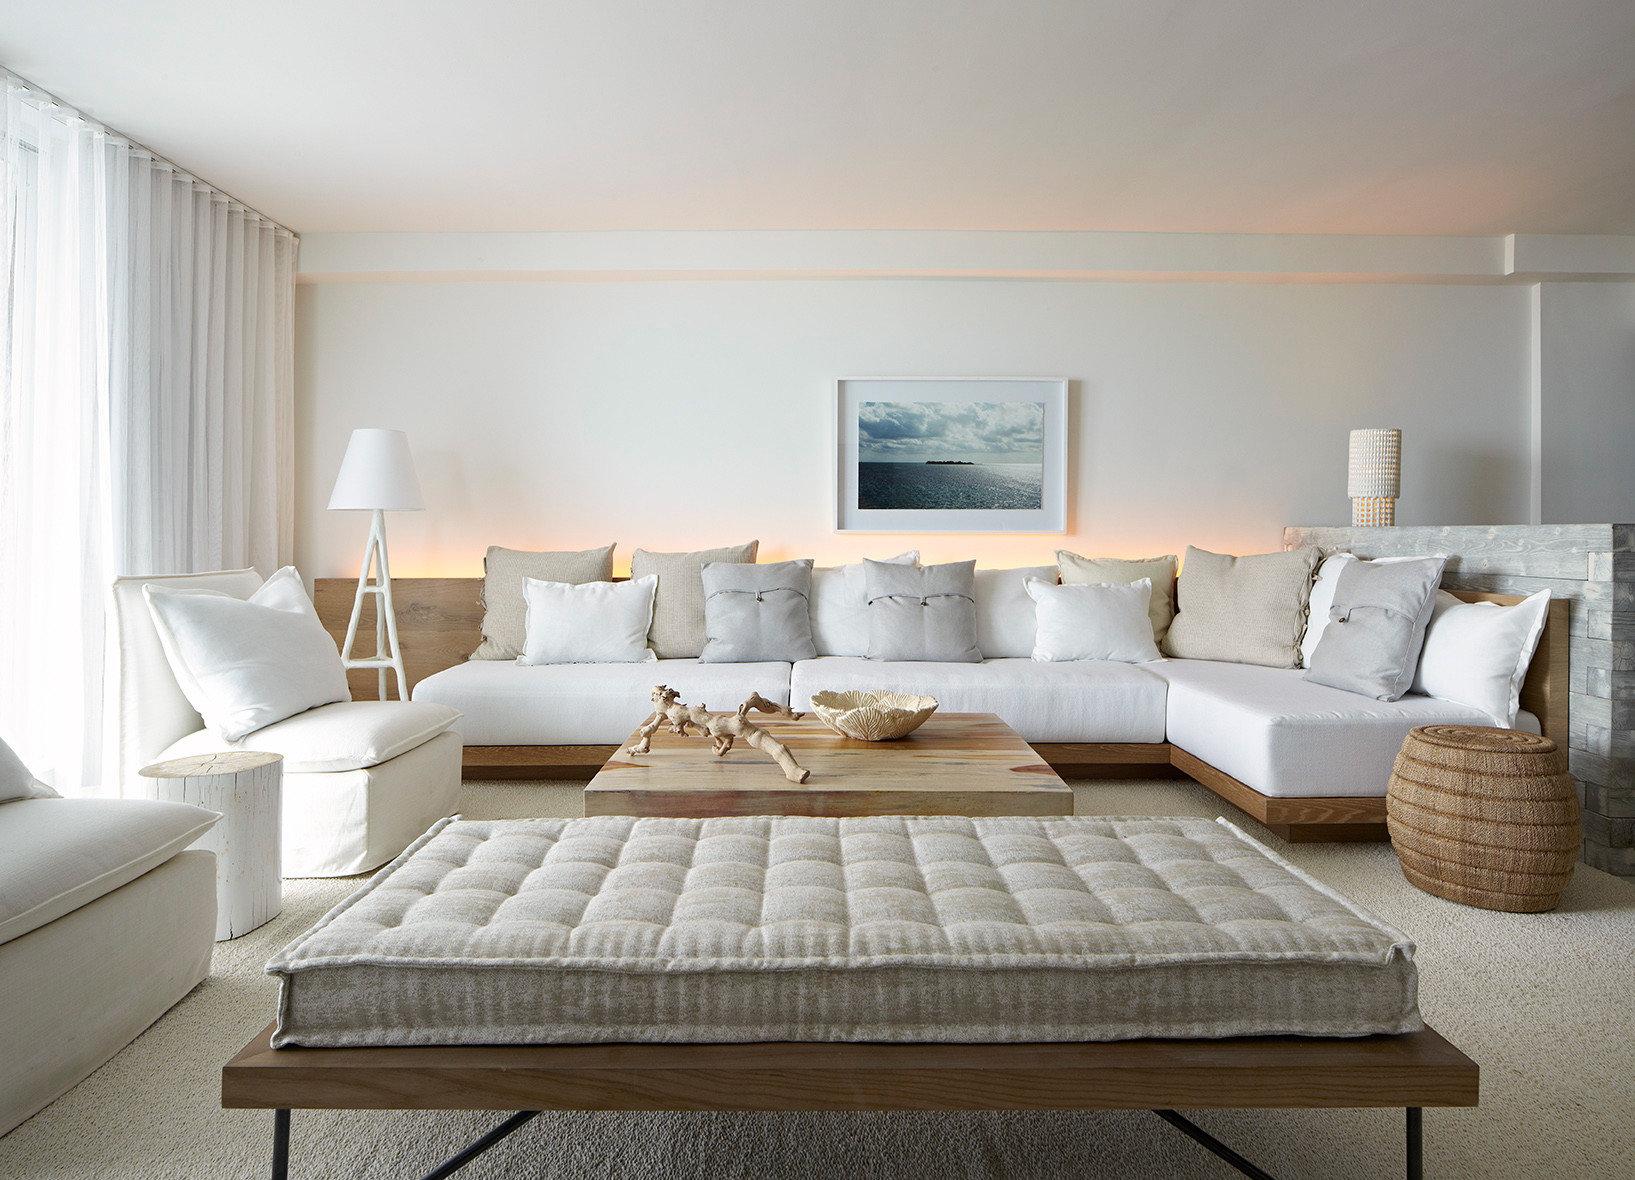 City Hip Hotels Living Lounge Luxury Miami Beach Scenic Views Trip Ideas Indoor Wall Floor